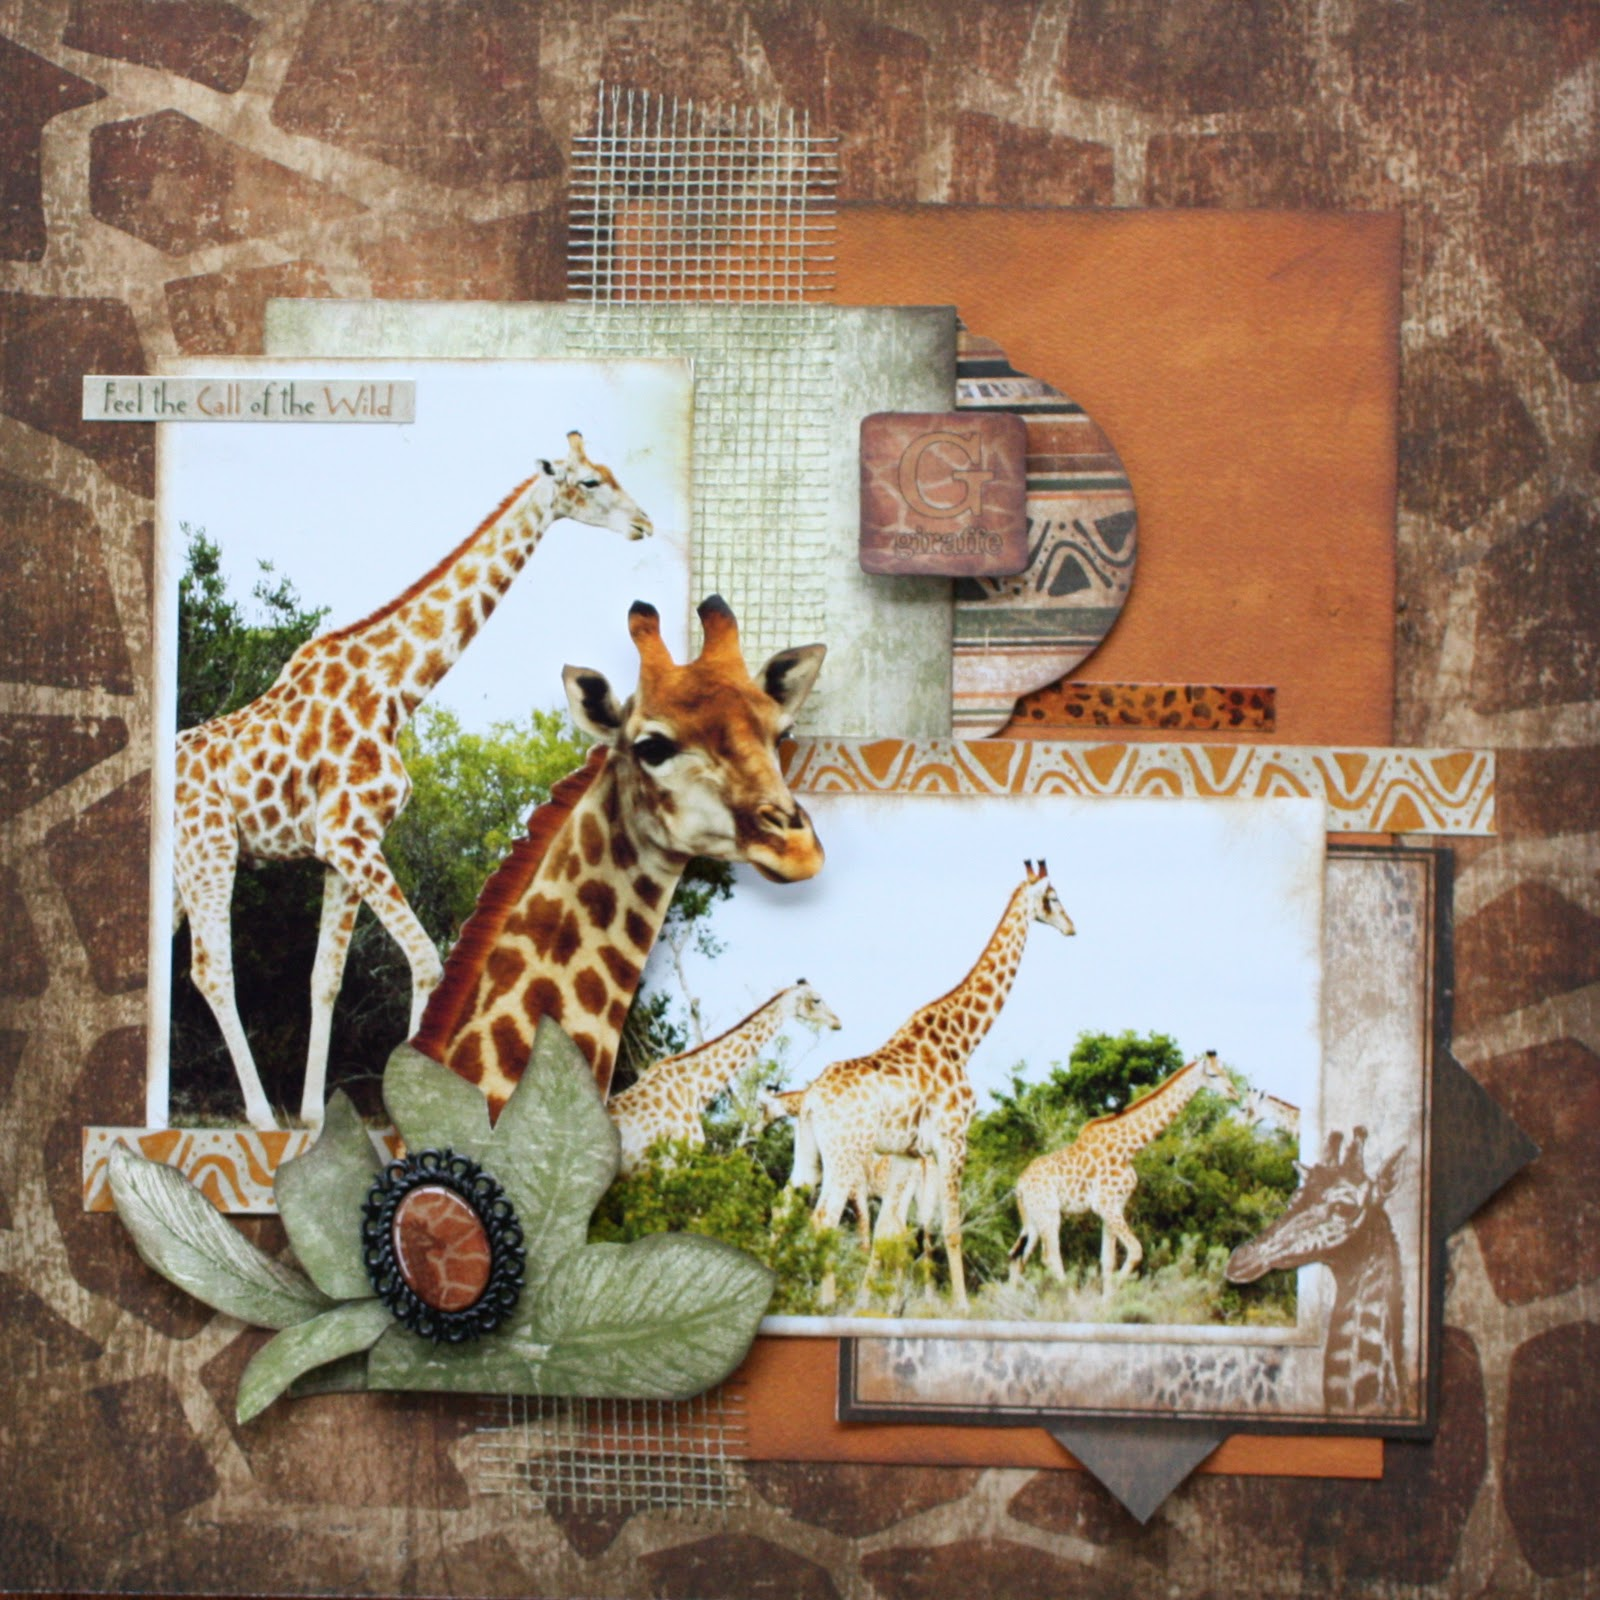 Zoo animal scrapbook ideas - Wet Weather Timetable Bobunny Zoology Layouts